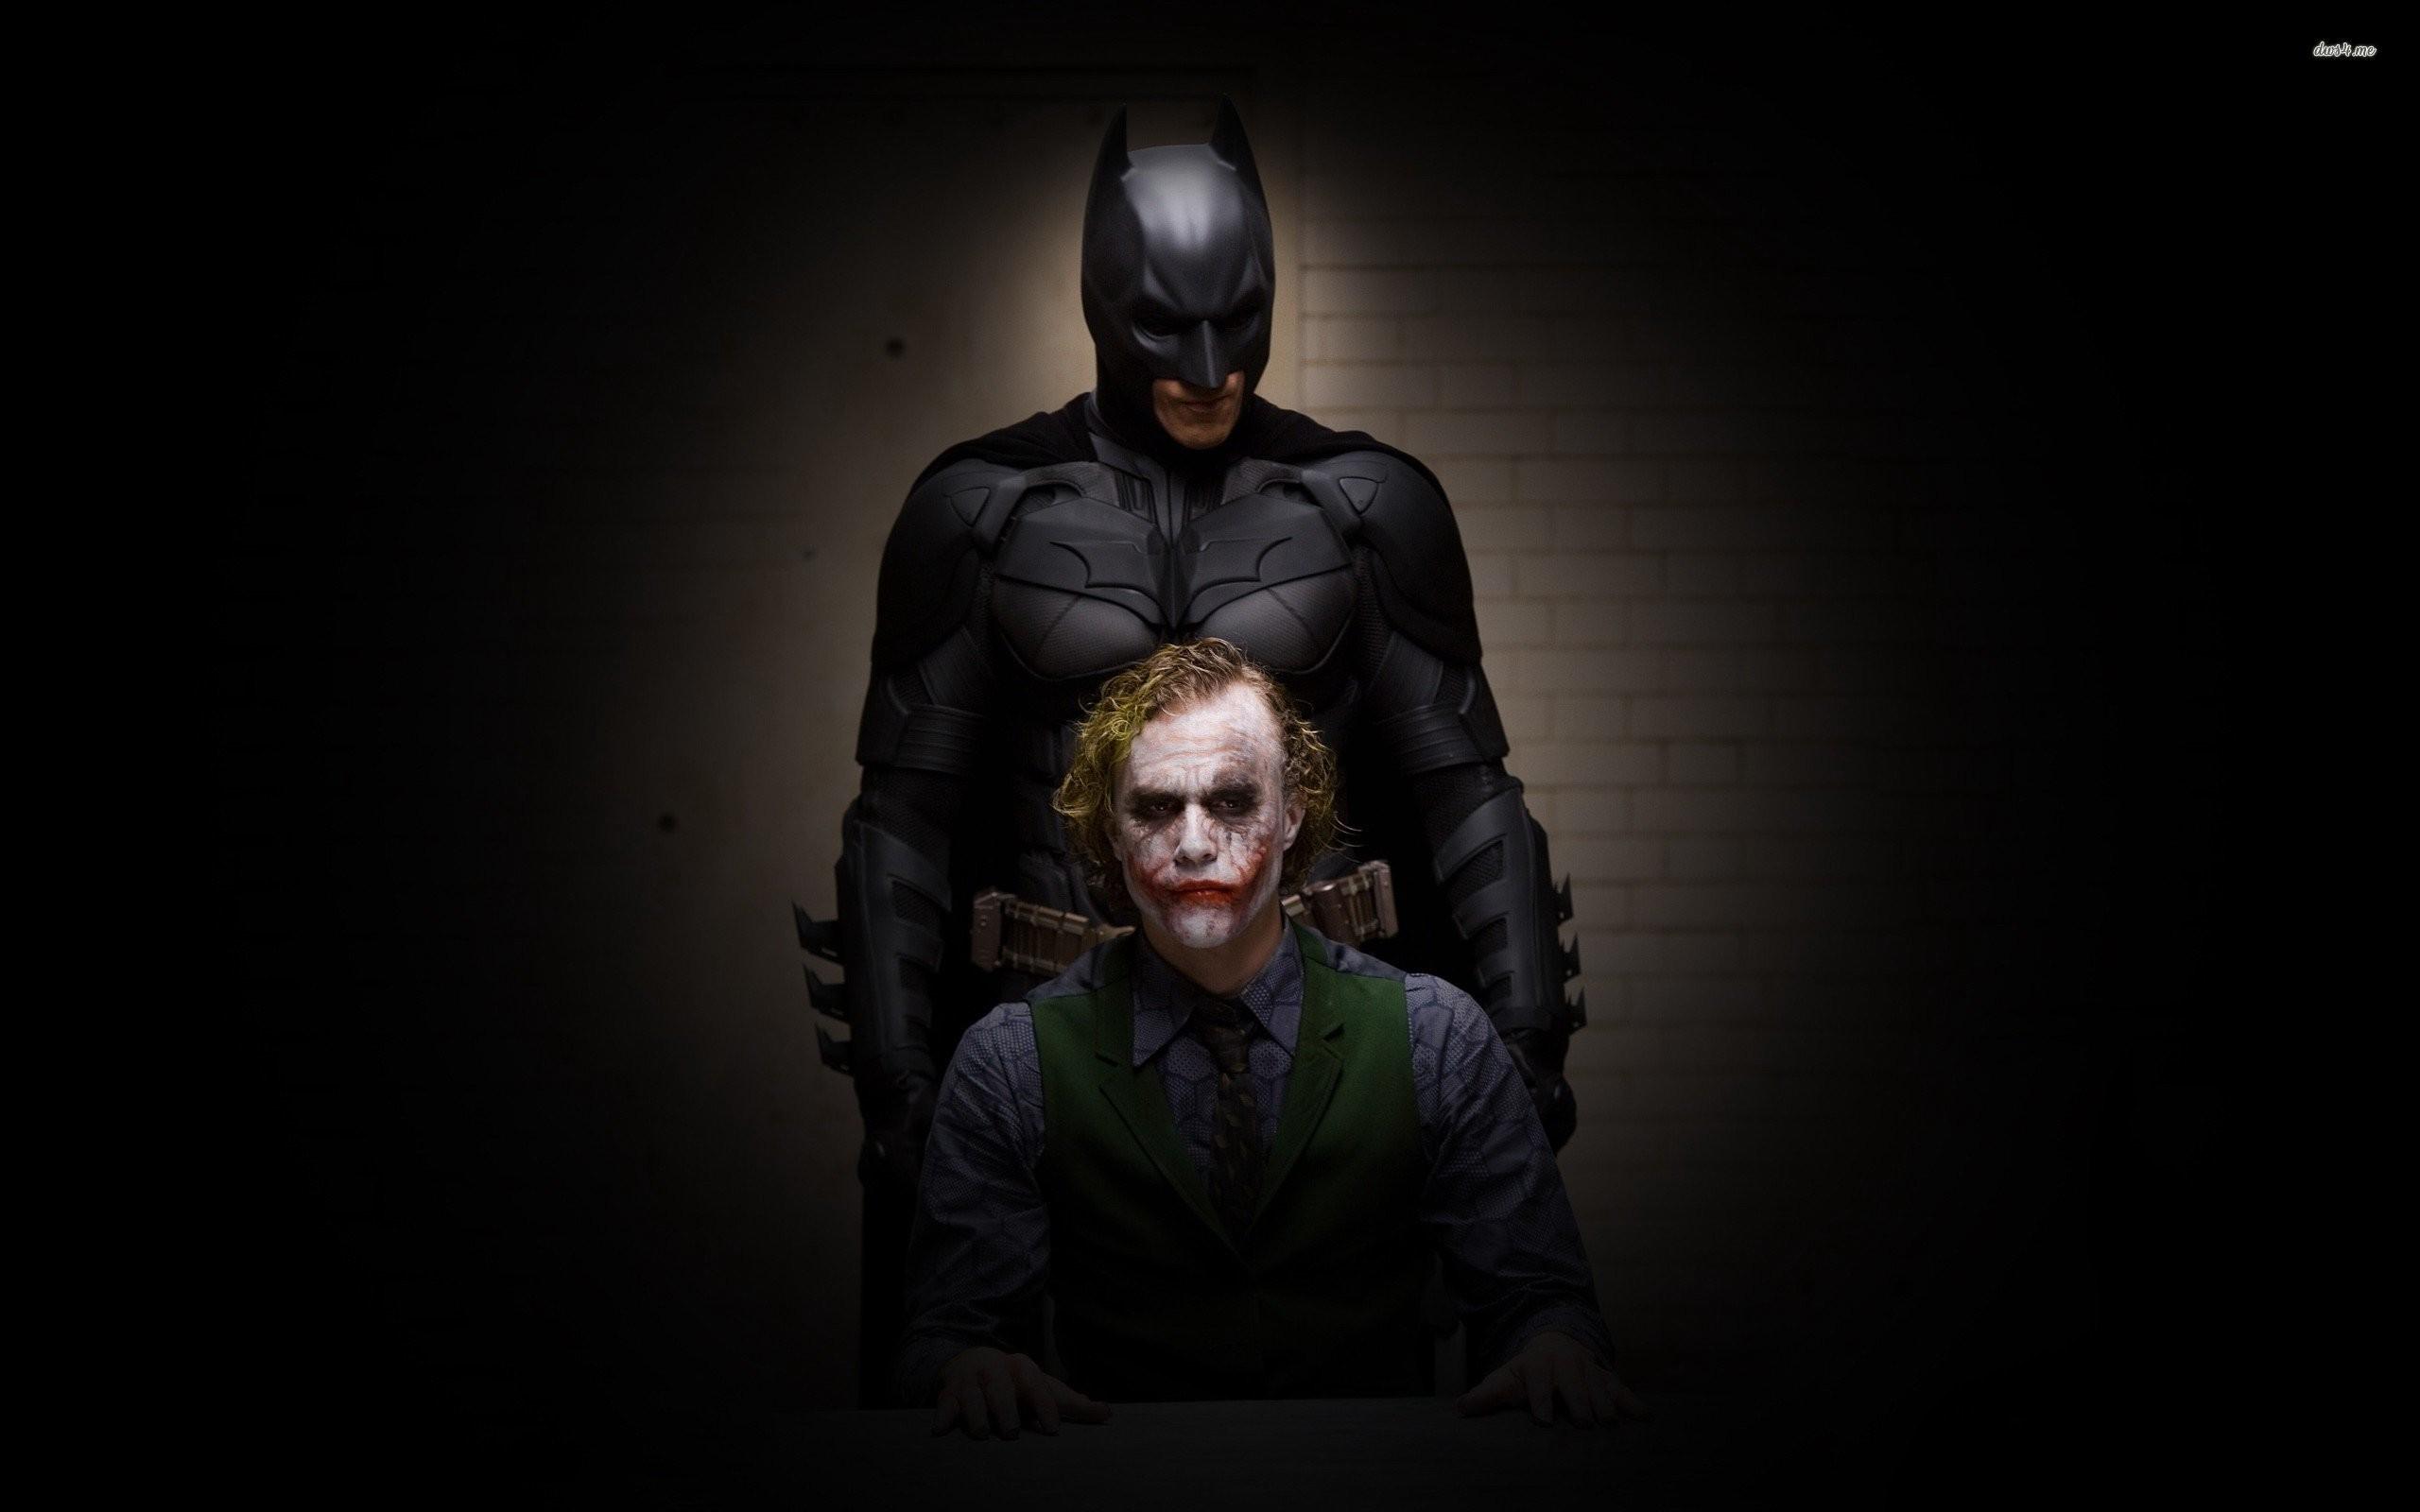 Batman And The Joker – Dark Knight …